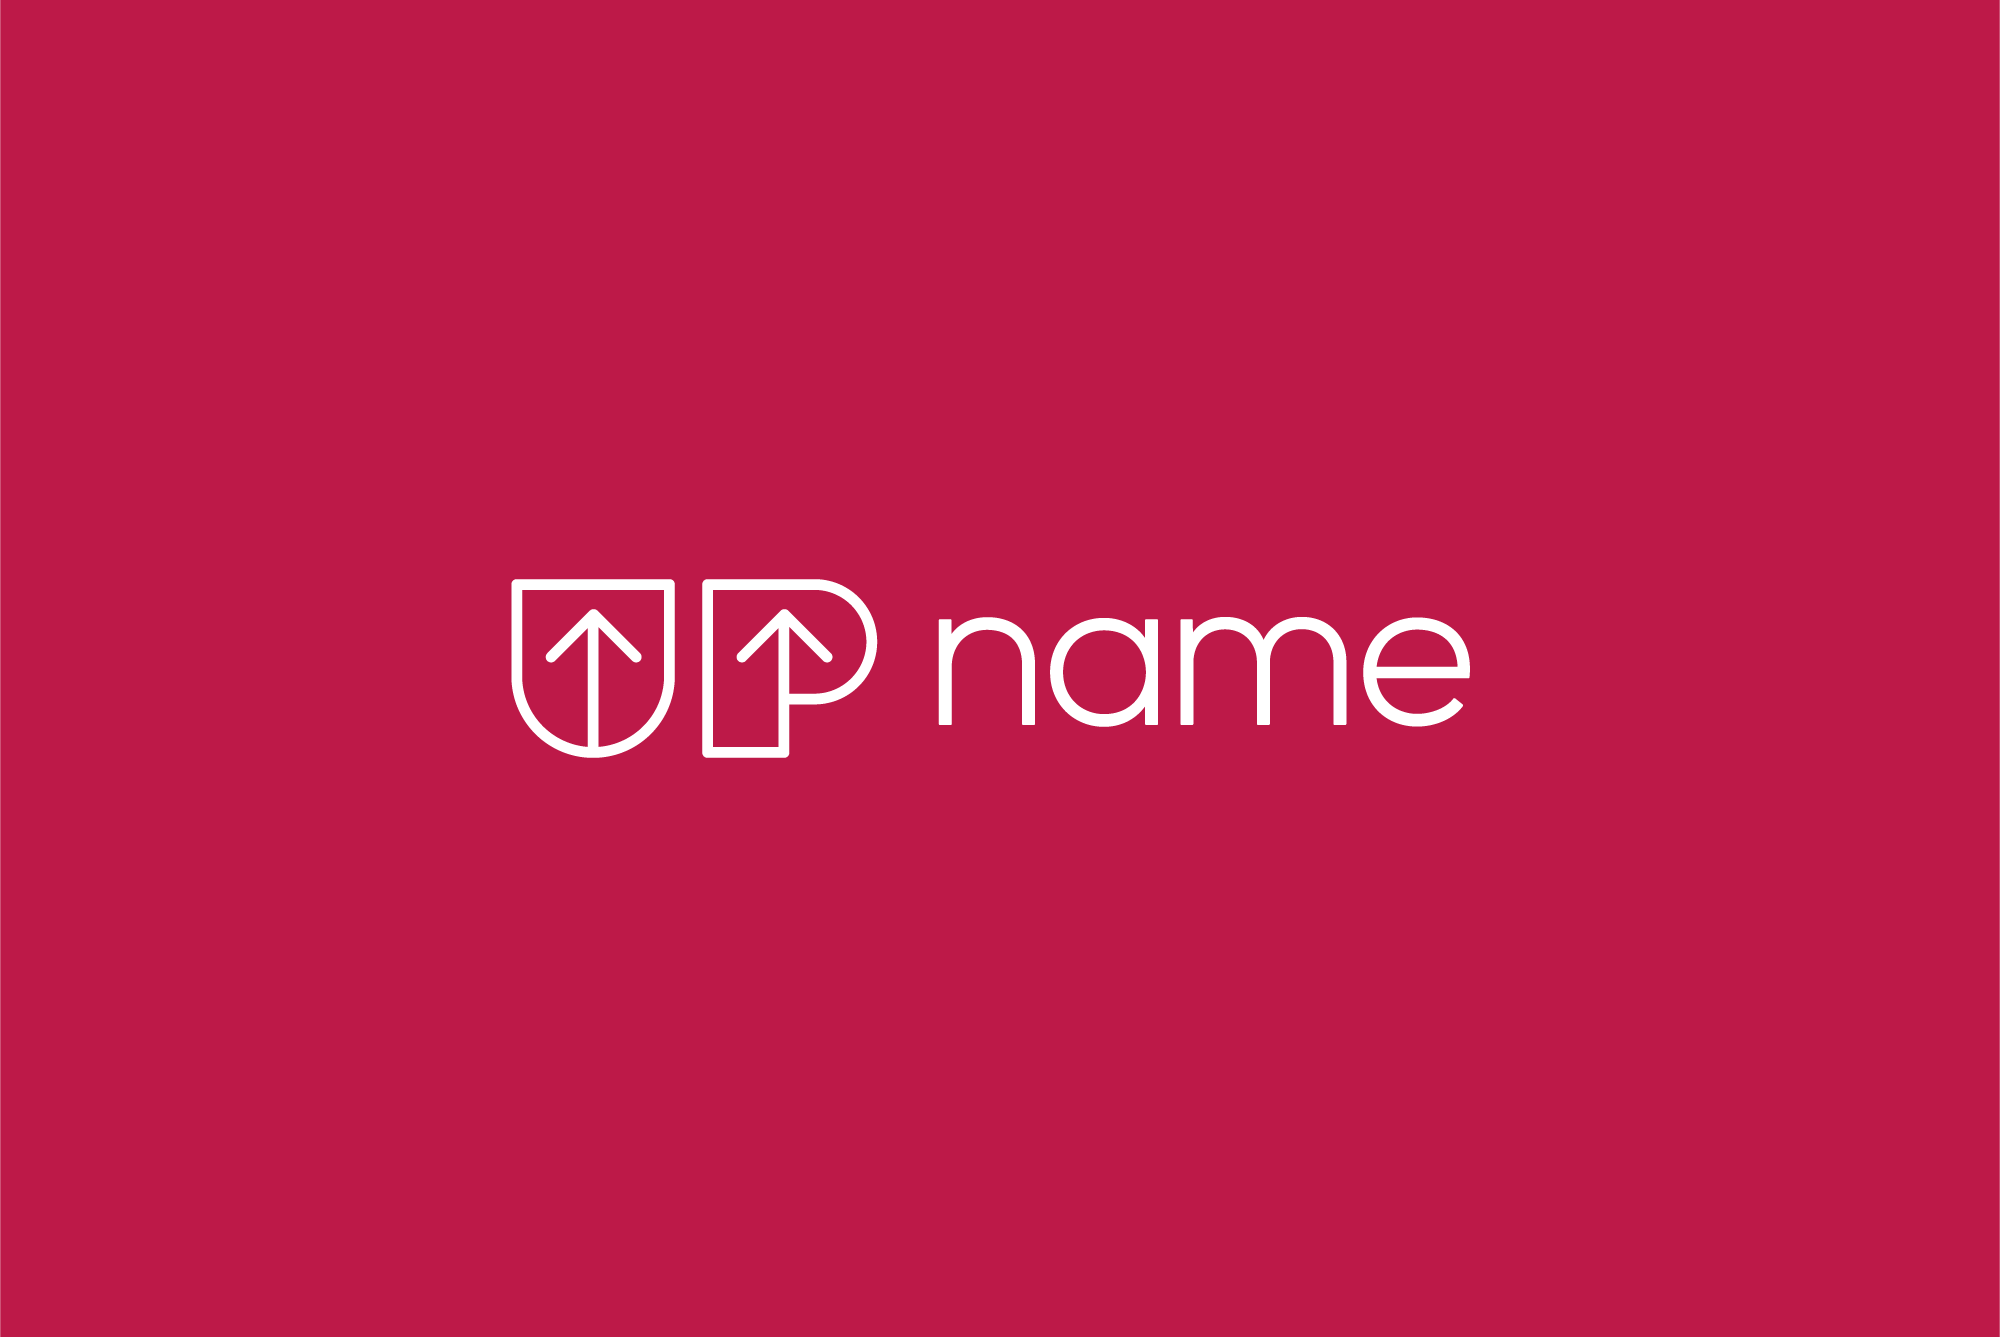 UP name logo example image 2